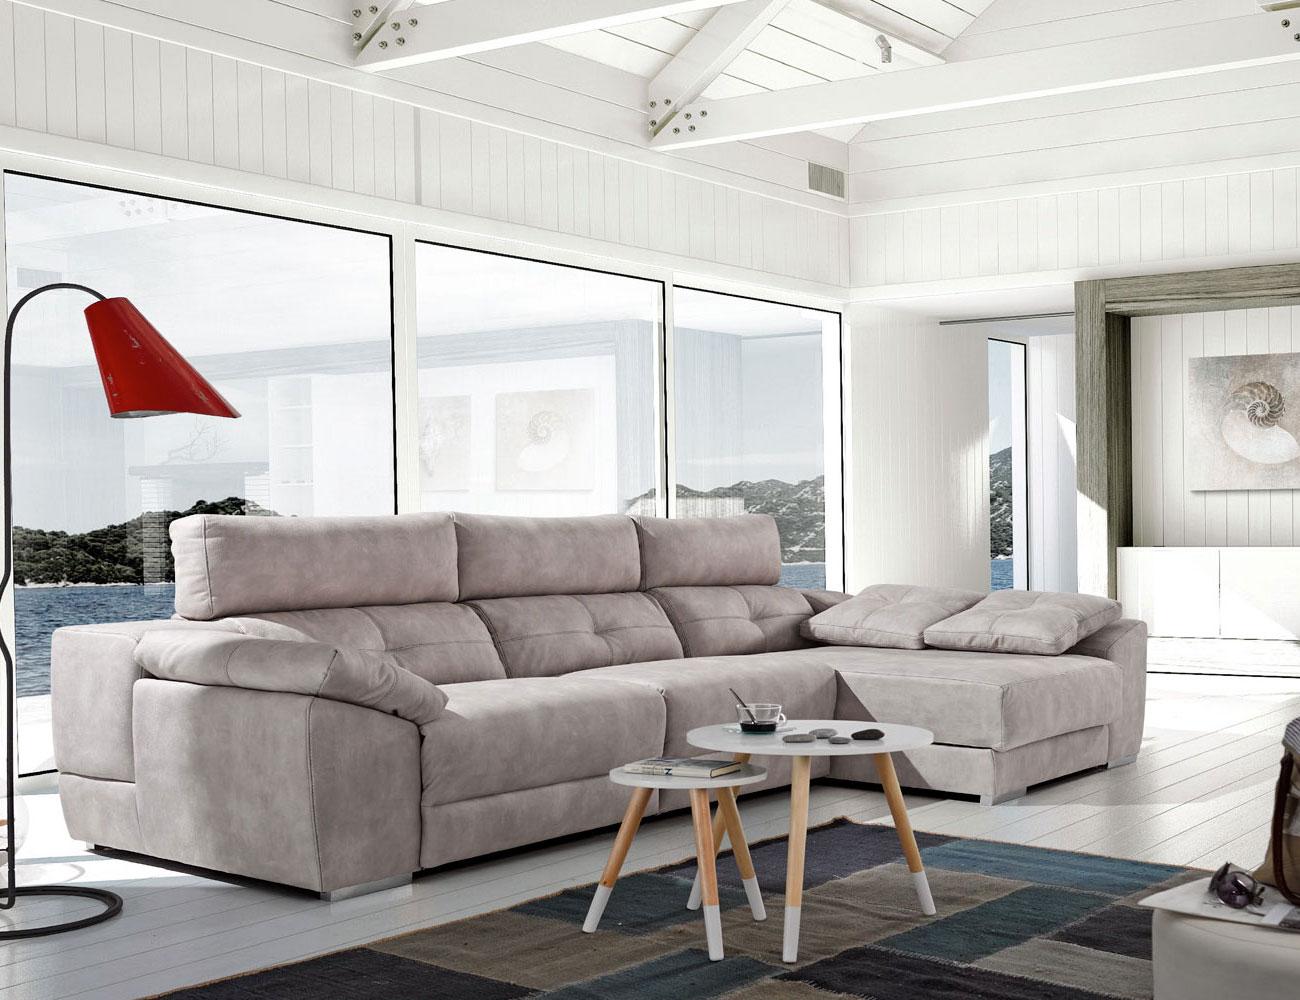 Sofa chaiselongue relax motor acomodel1